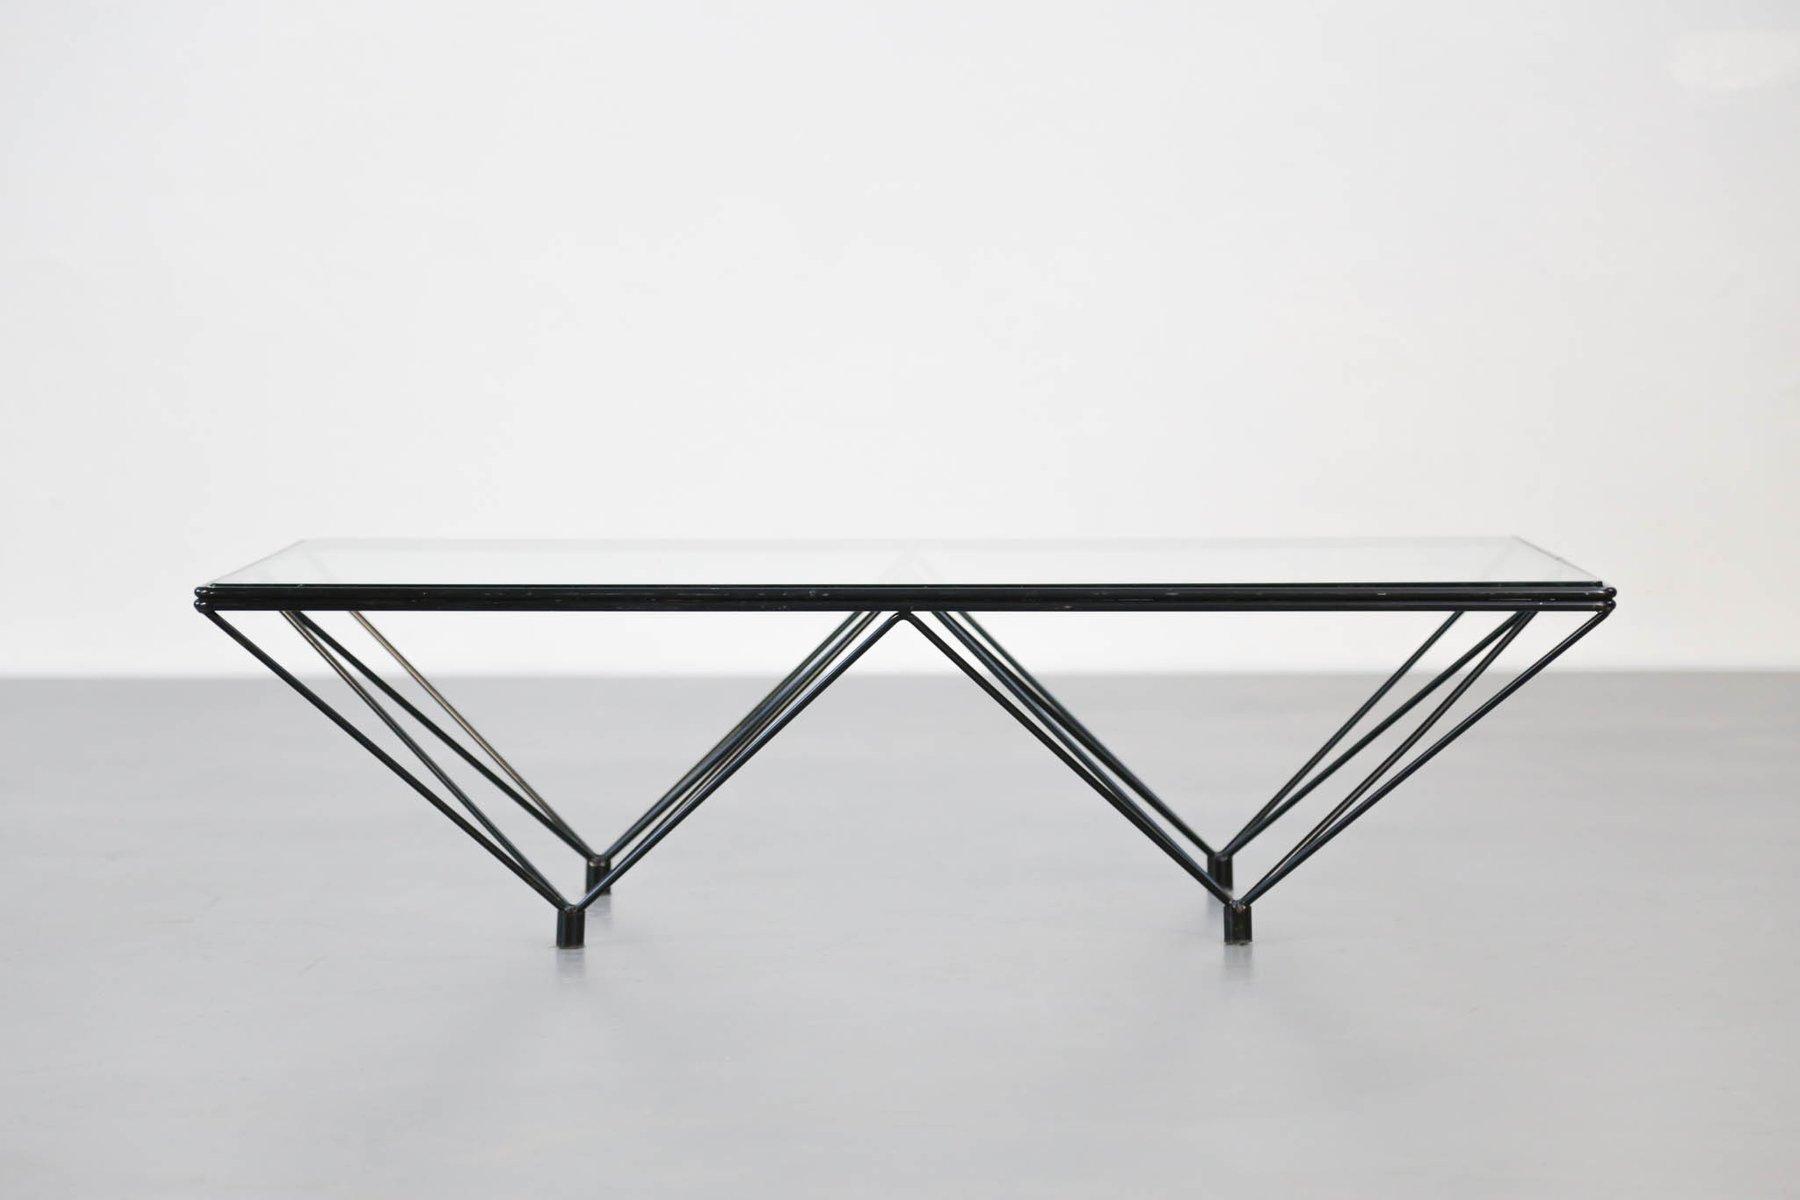 table basse vintage g om trique avec plateau en verre en vente sur pamono. Black Bedroom Furniture Sets. Home Design Ideas